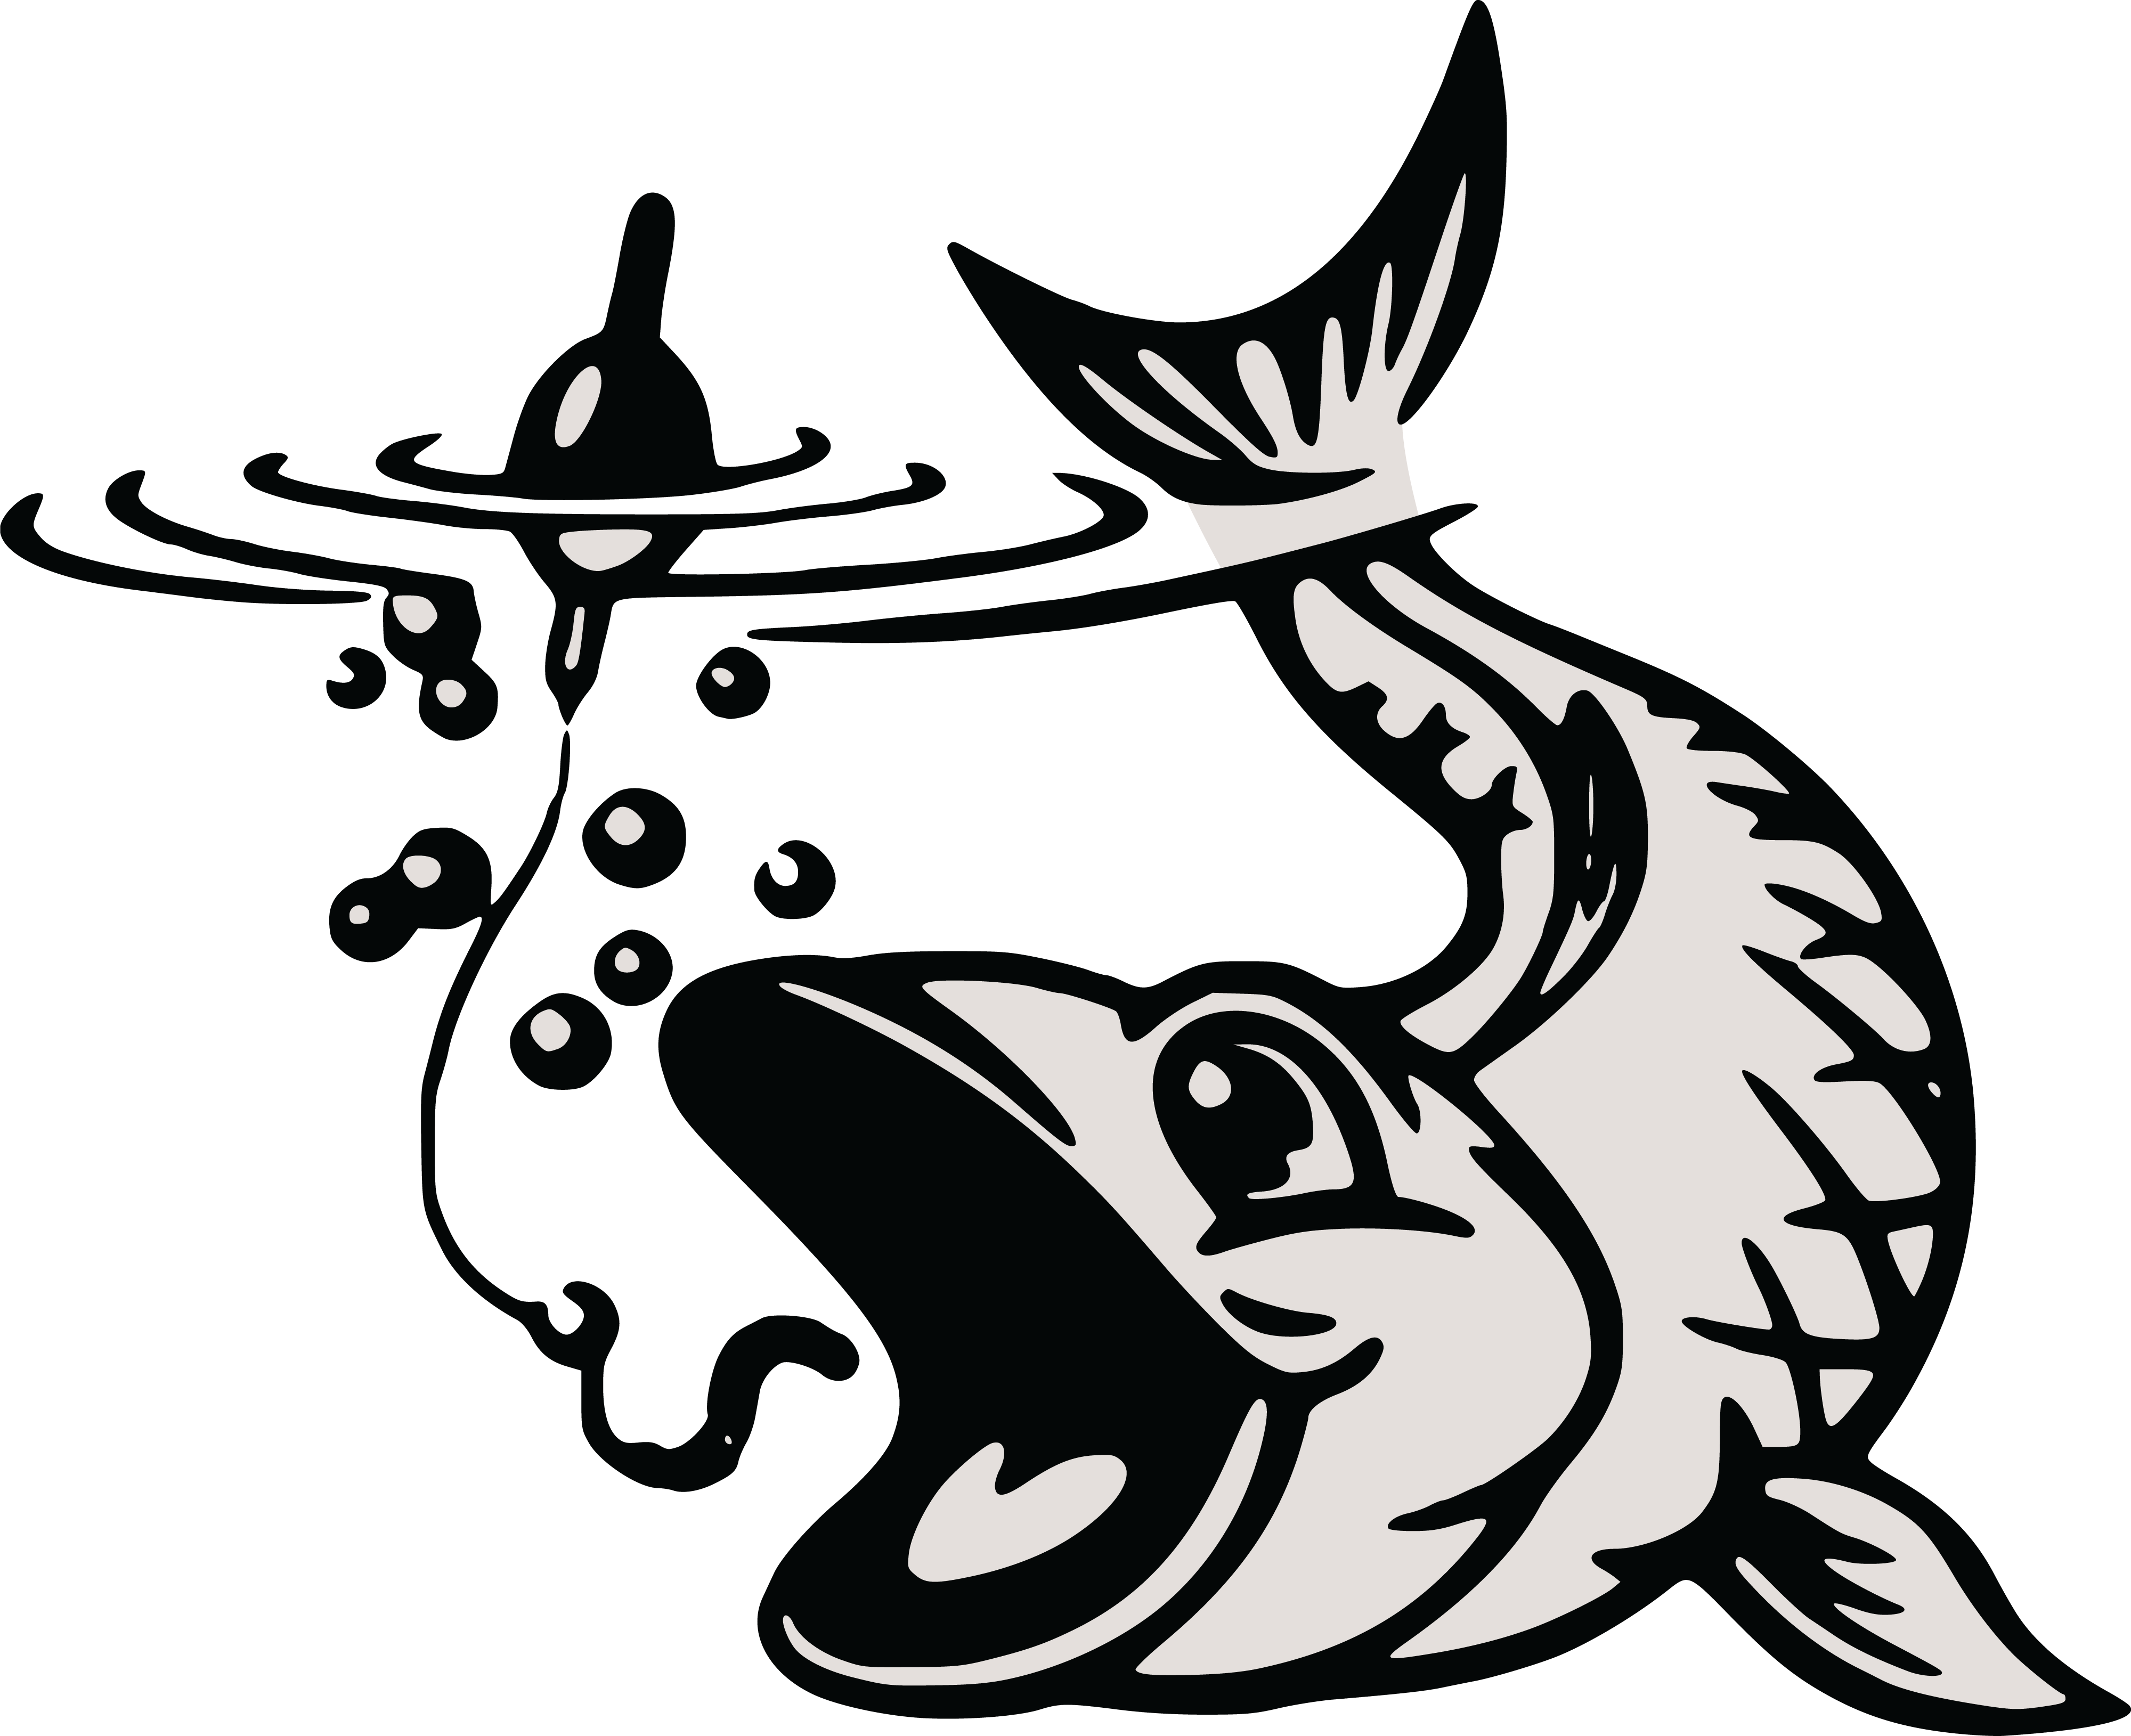 Fish hooks clipart png free download Fish hook Fishing bait Recreational fishing Clip art - Fishing 4000 ... png free download